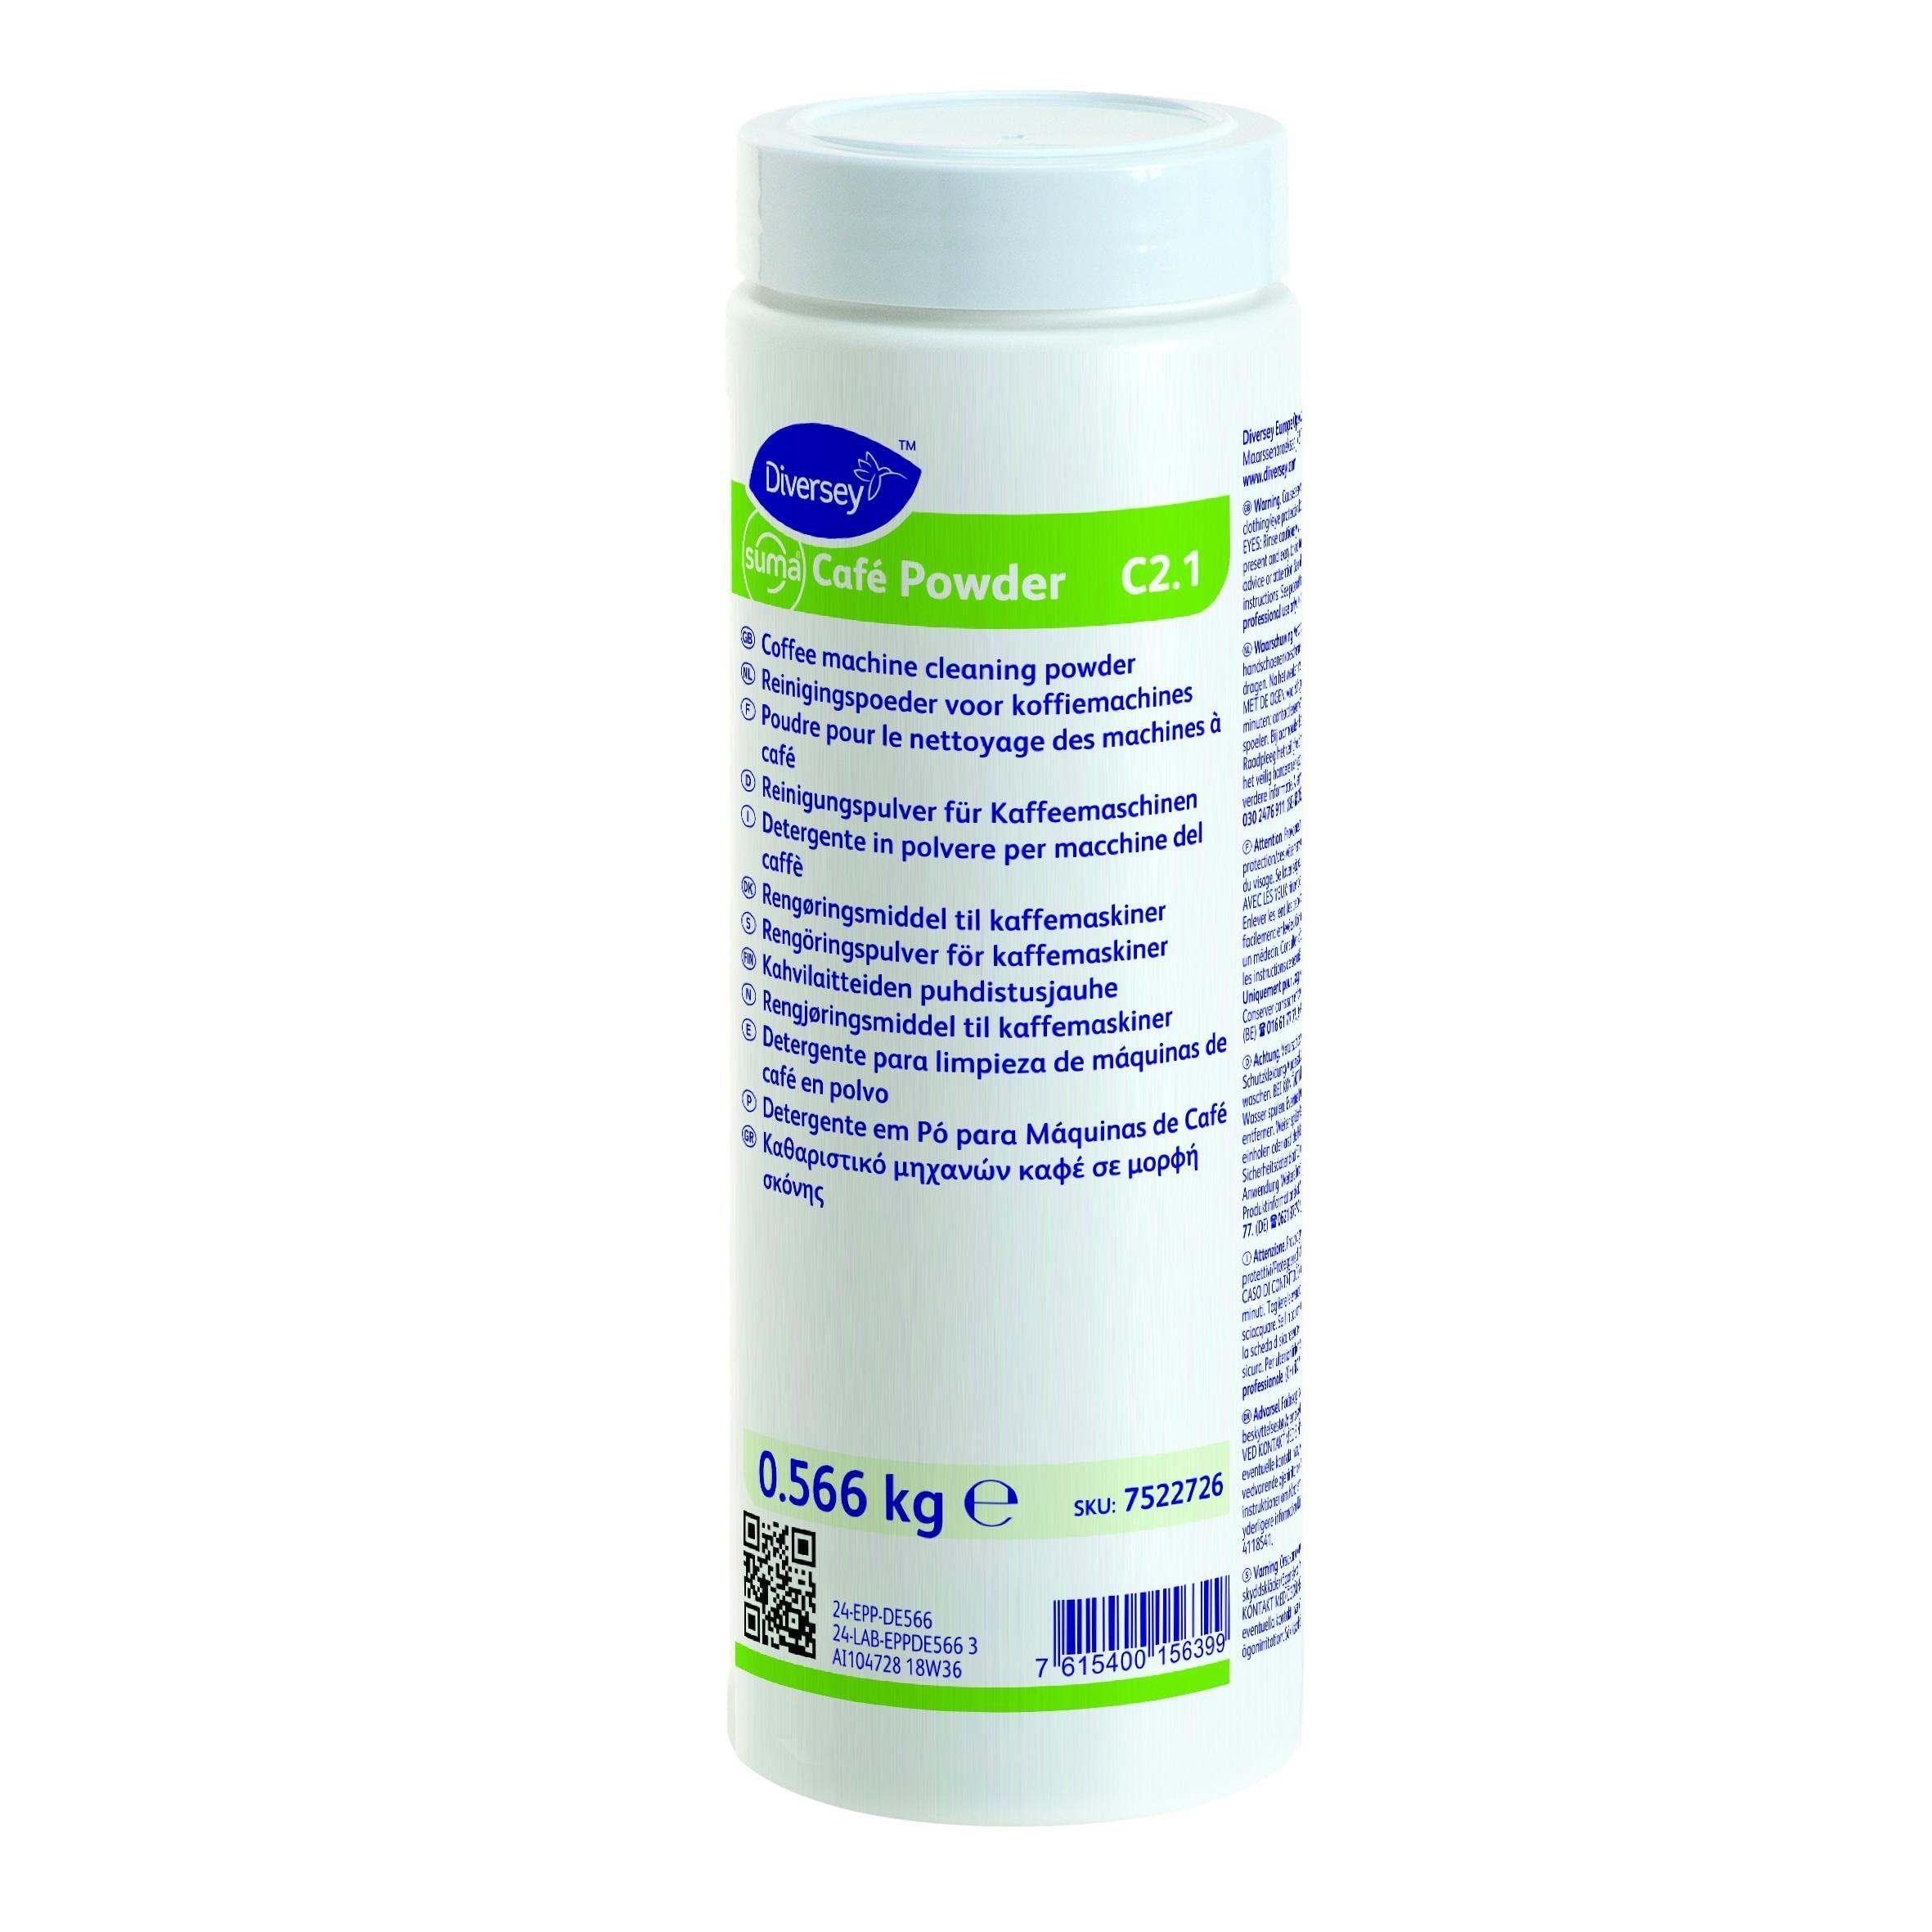 7522726-Suma-Cafe-Powder-C2.1-0.566kg-CMYK-20x20cm.jpg